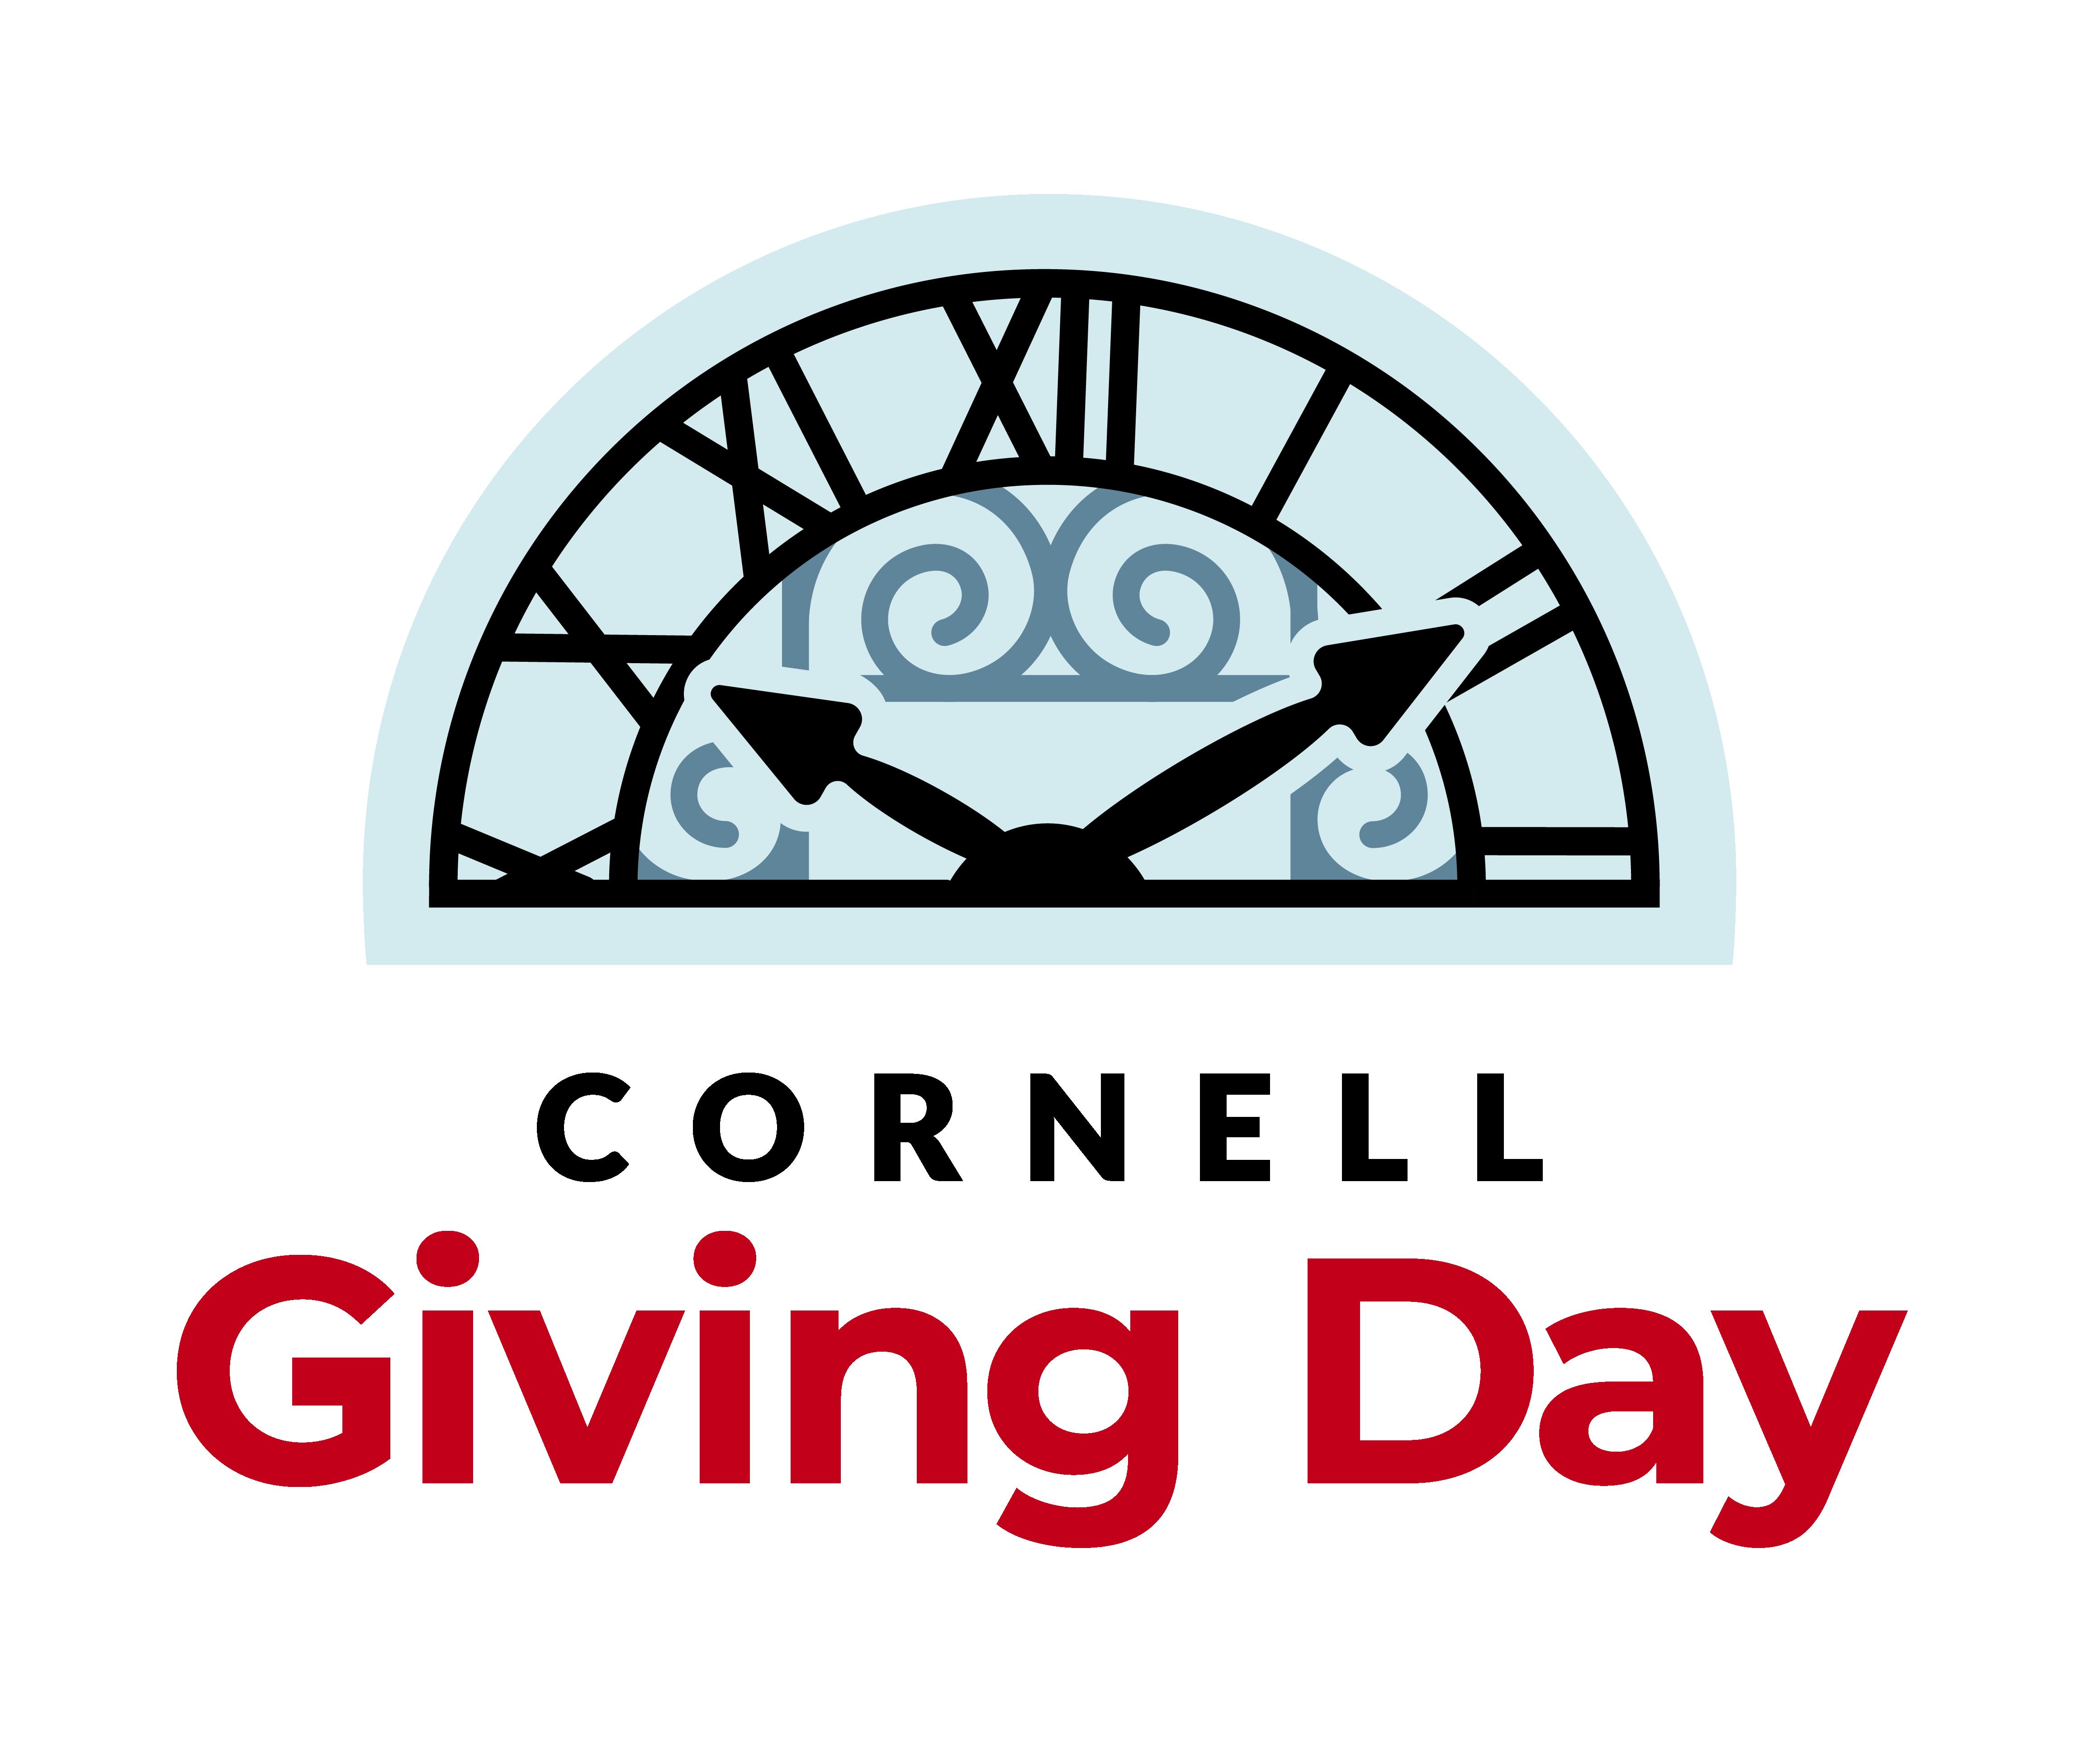 Giving Day clock logo